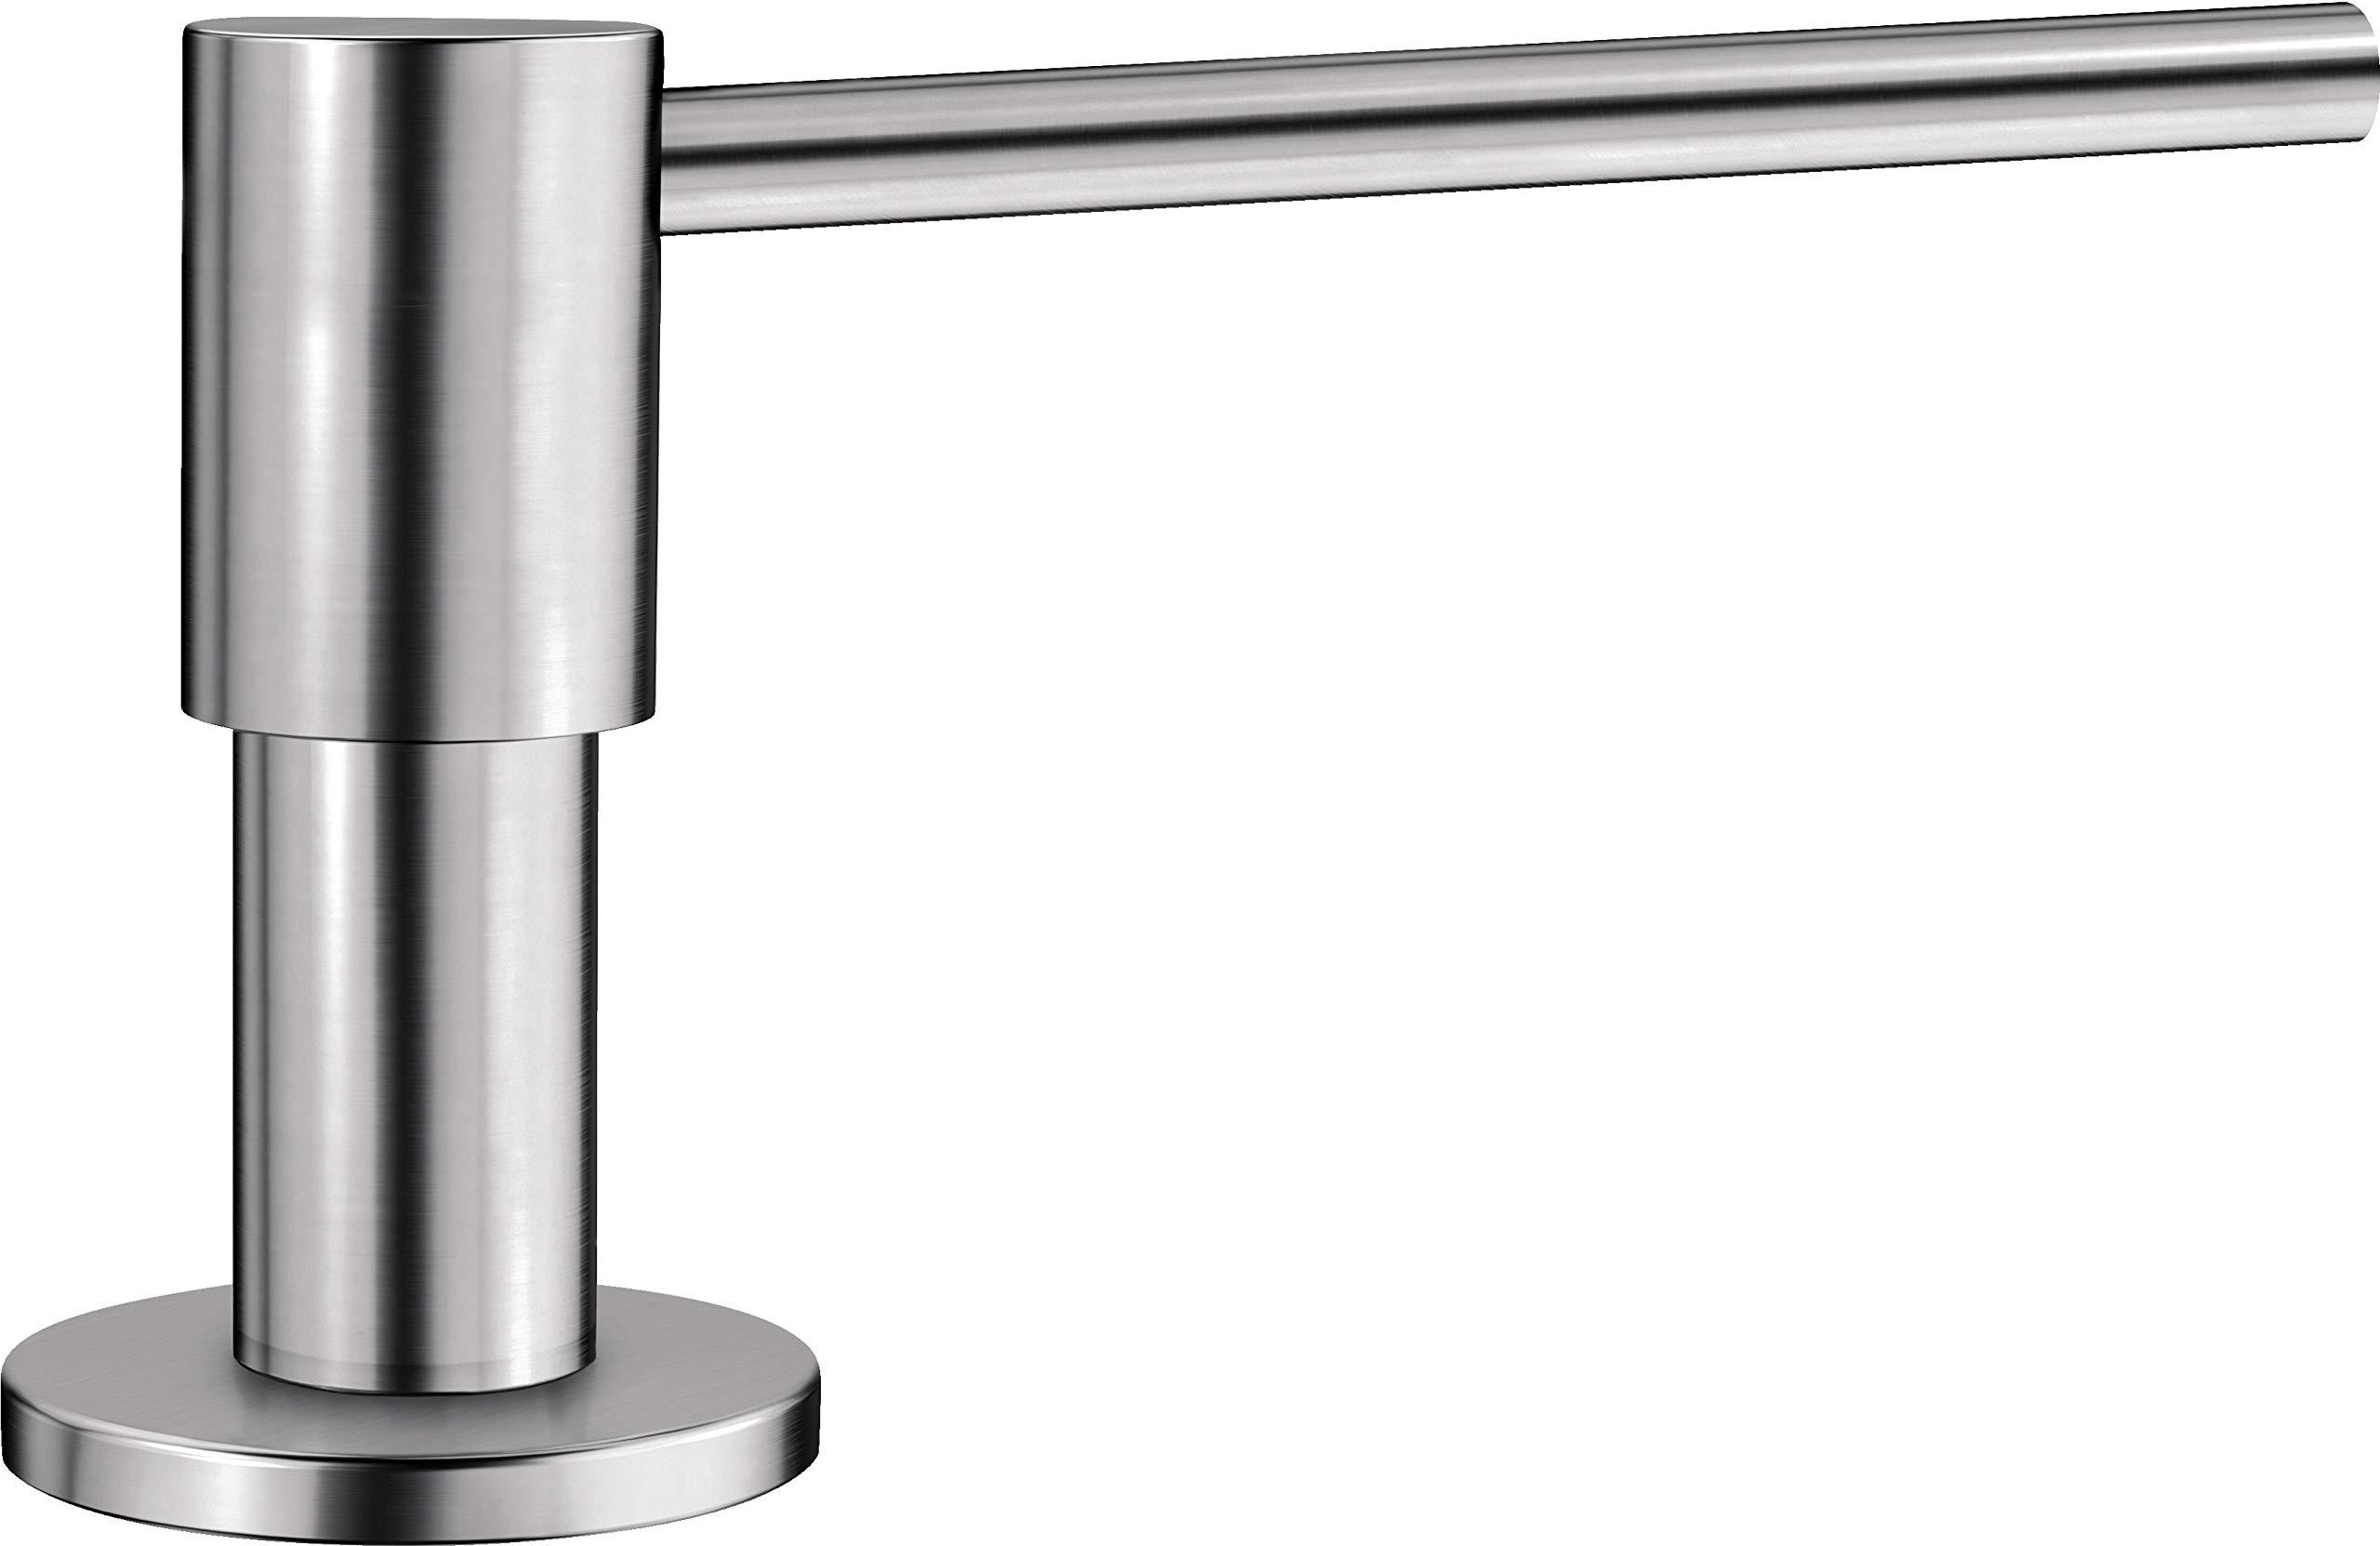 BLANCOPIONA, soap dispenser, stainless steel, 517537 by BLANCO (Image #1)